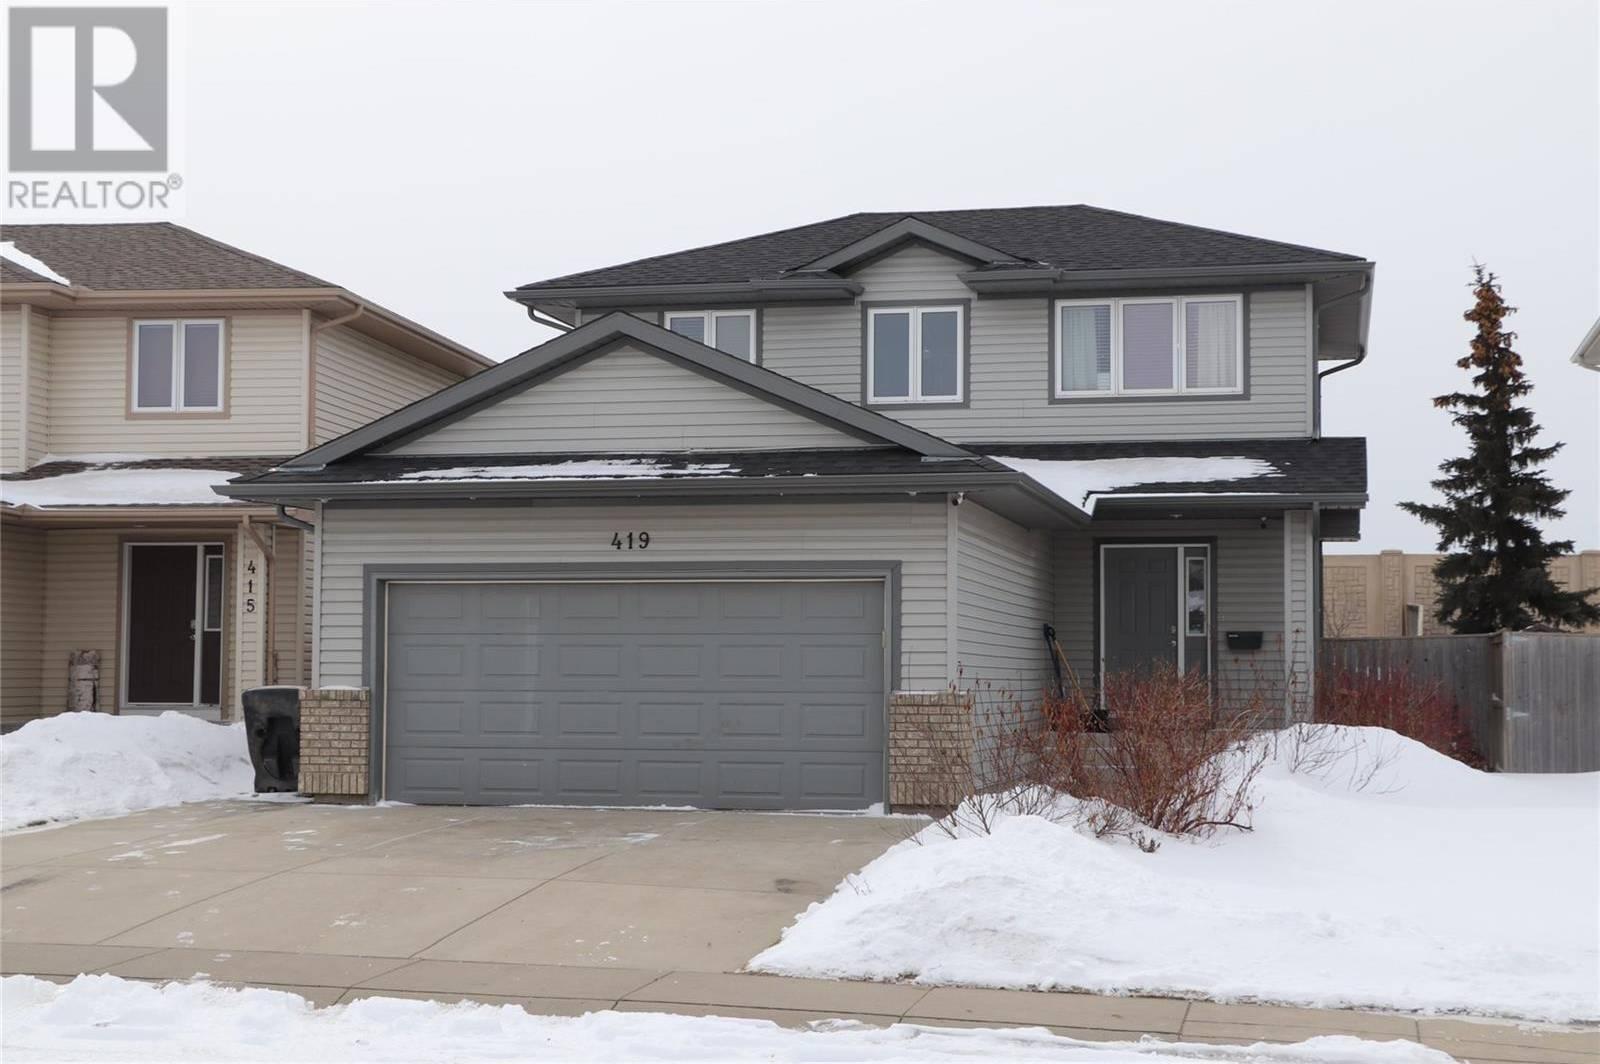 House for sale at 419 Buckwold Cv  Saskatoon Saskatchewan - MLS: SK804045